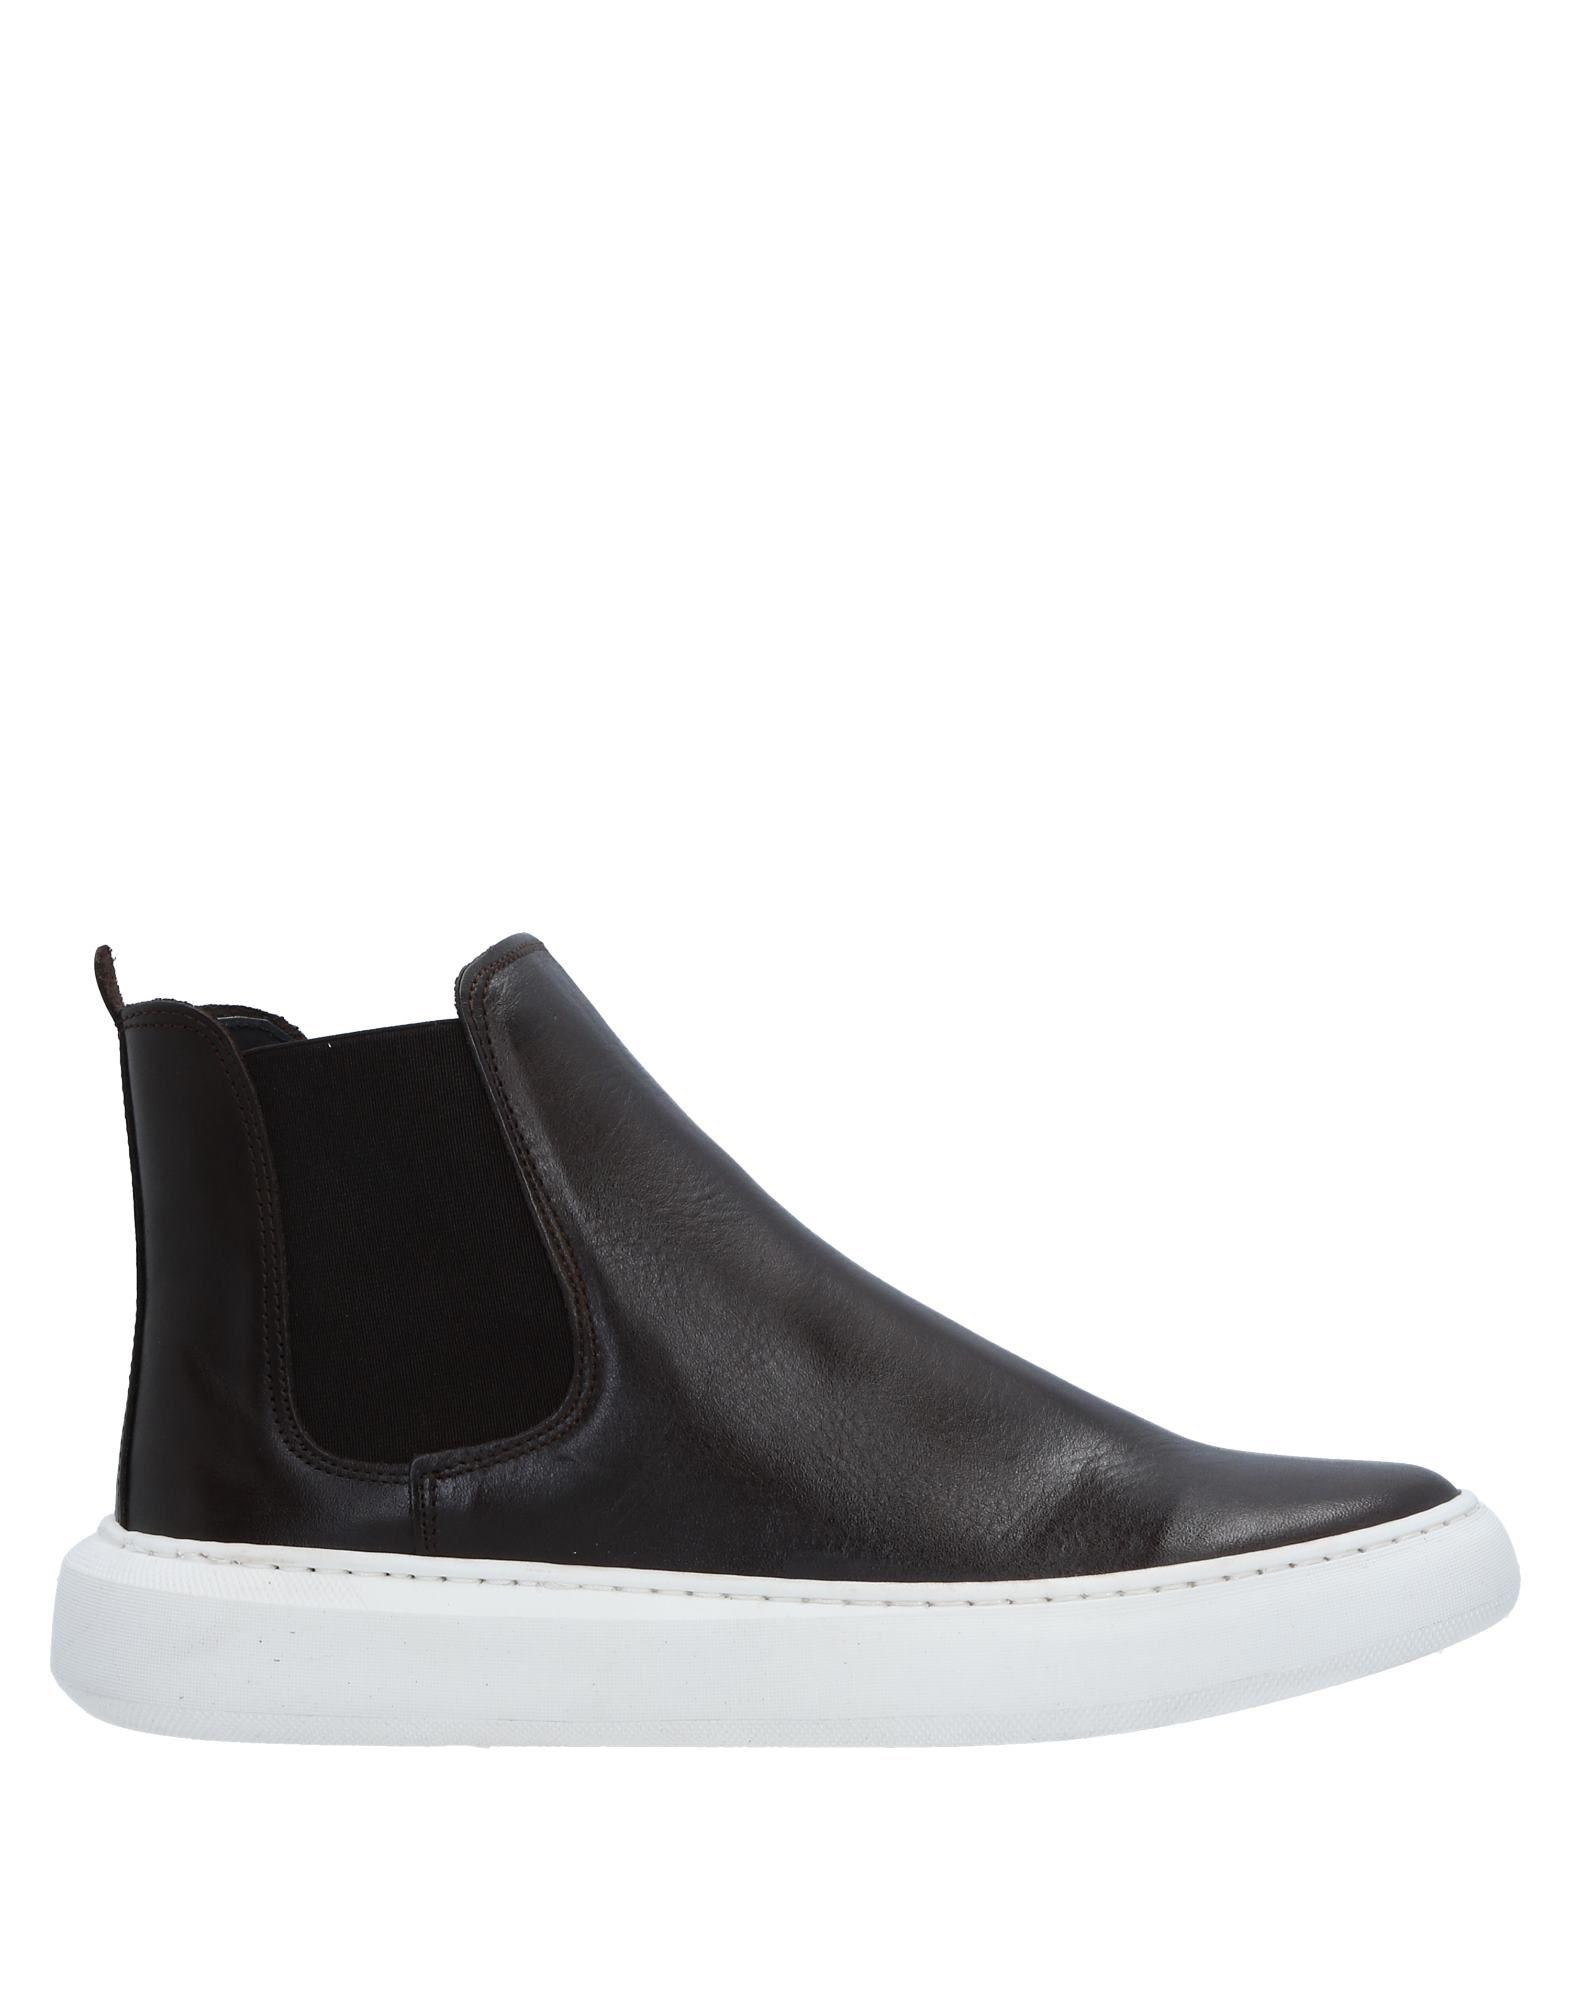 Bottega Marchigiana Boots - Men on Bottega Marchigiana Boots online on Men  United Kingdom - 11542367TR f64c2d